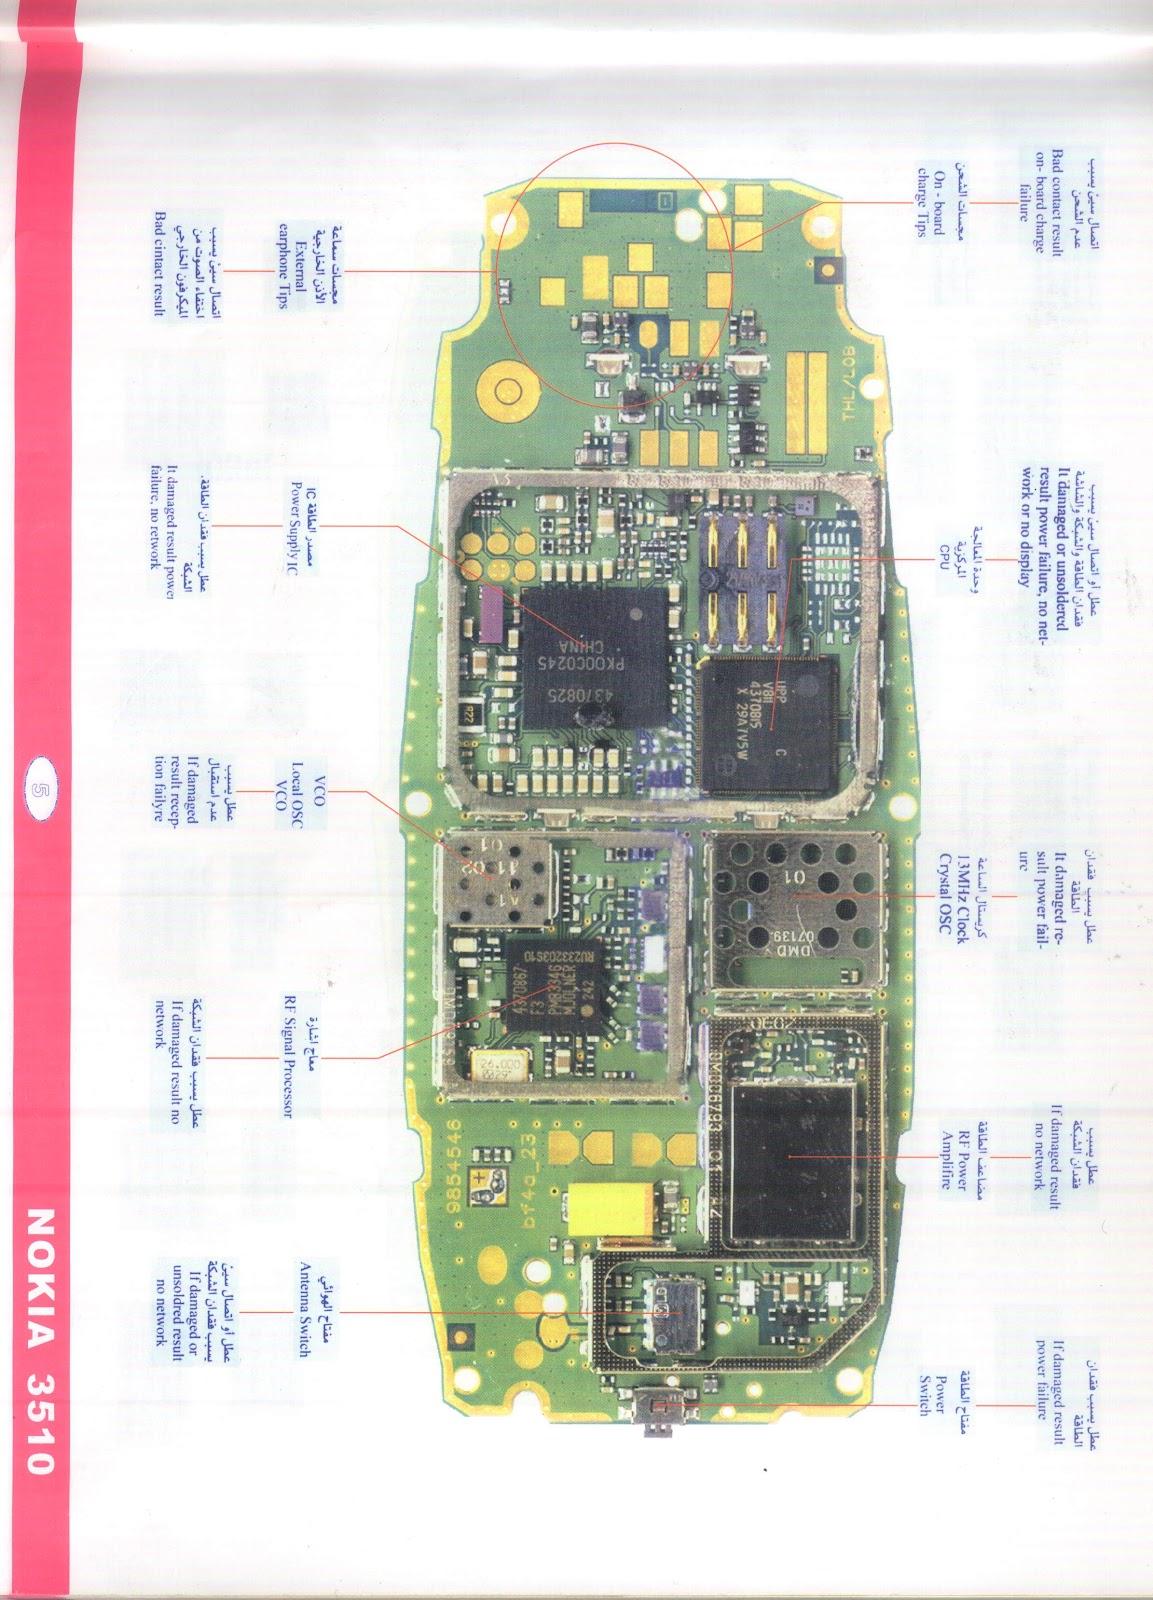 Nokia 3510 Circuit Board Details